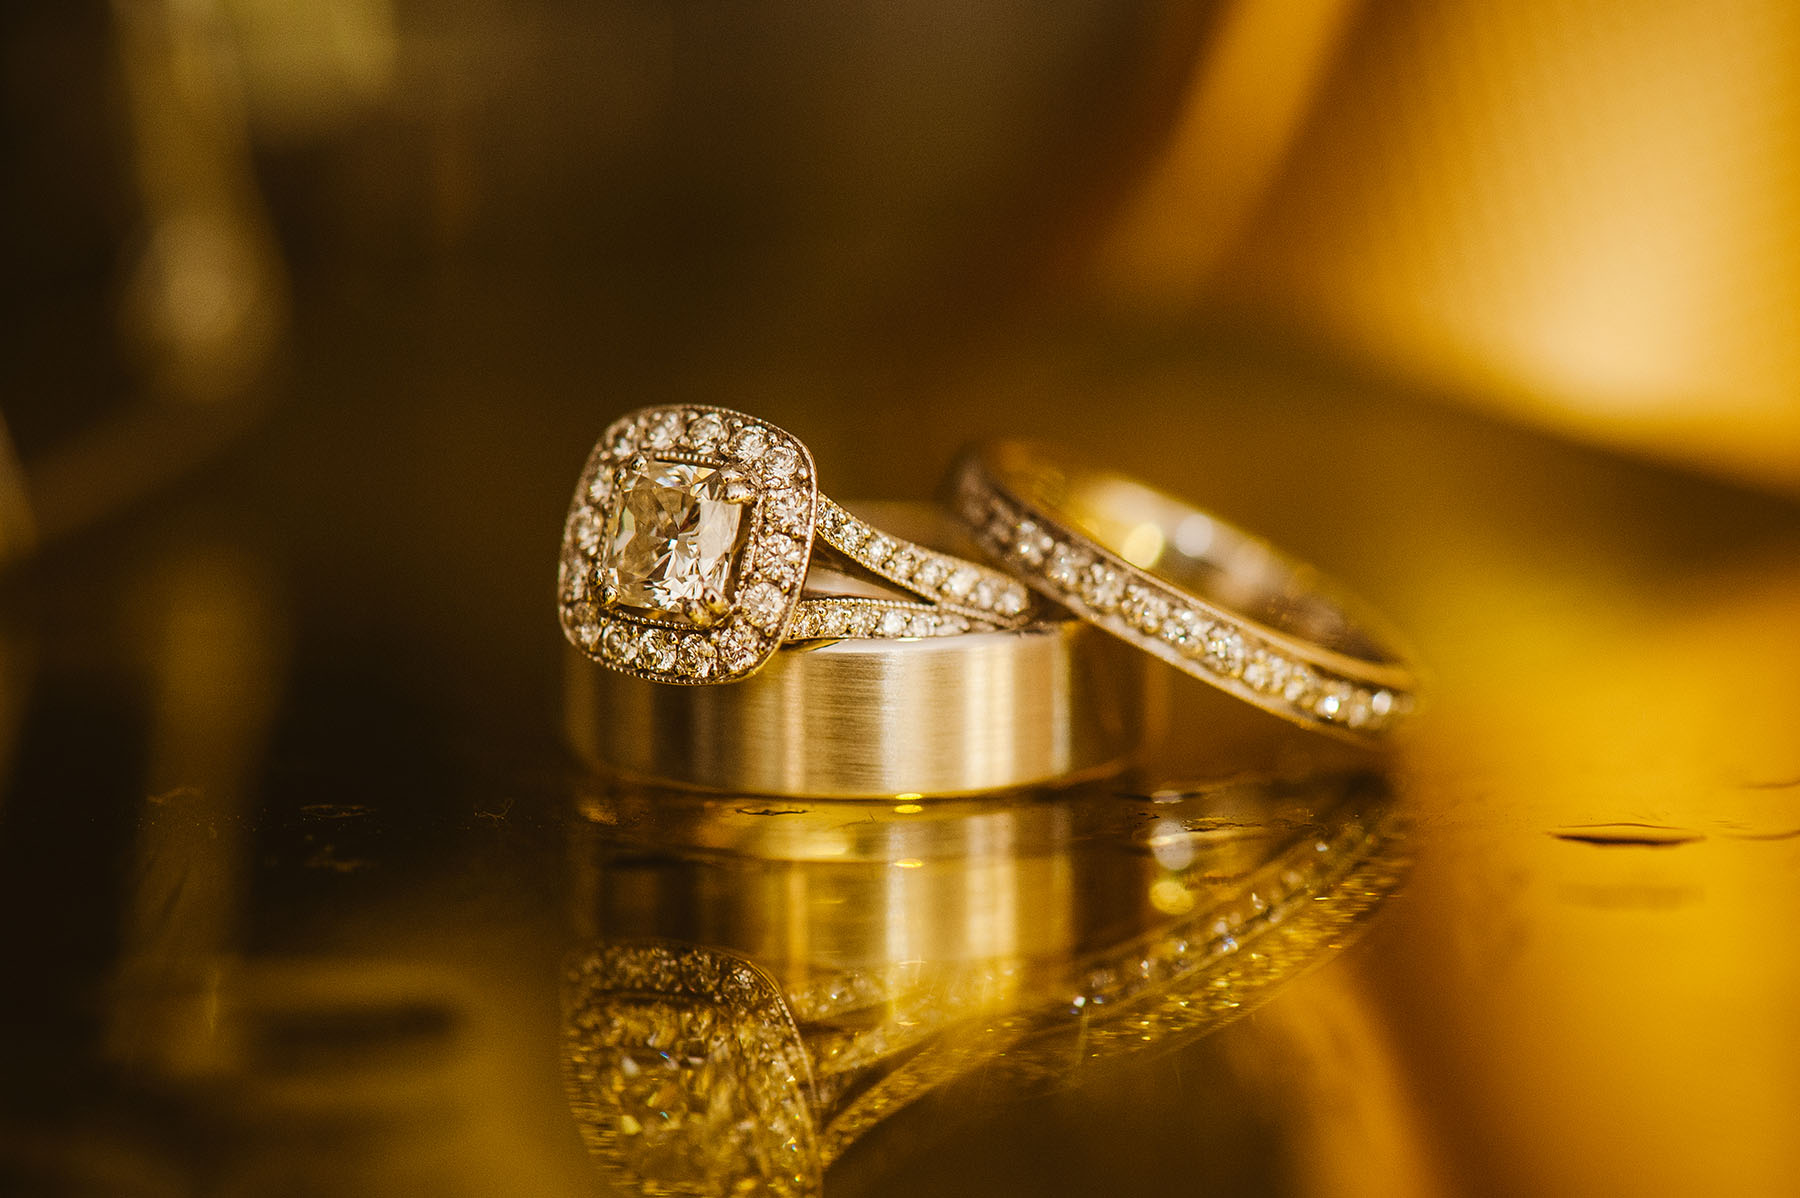 Marryme_wedding_photography_dorrigo_bellingen_photographer_10.jpg